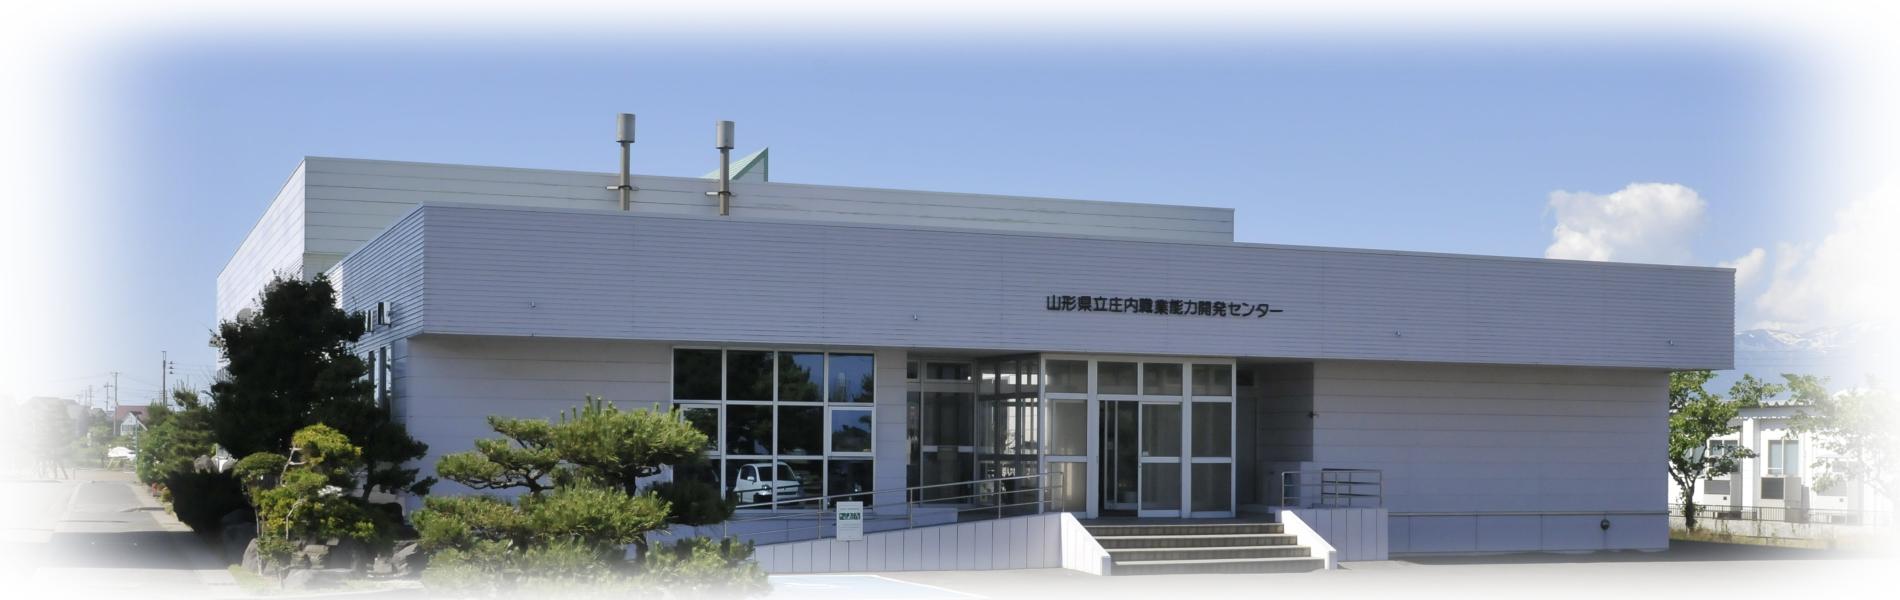 山形県立庄内職業能力開発センター